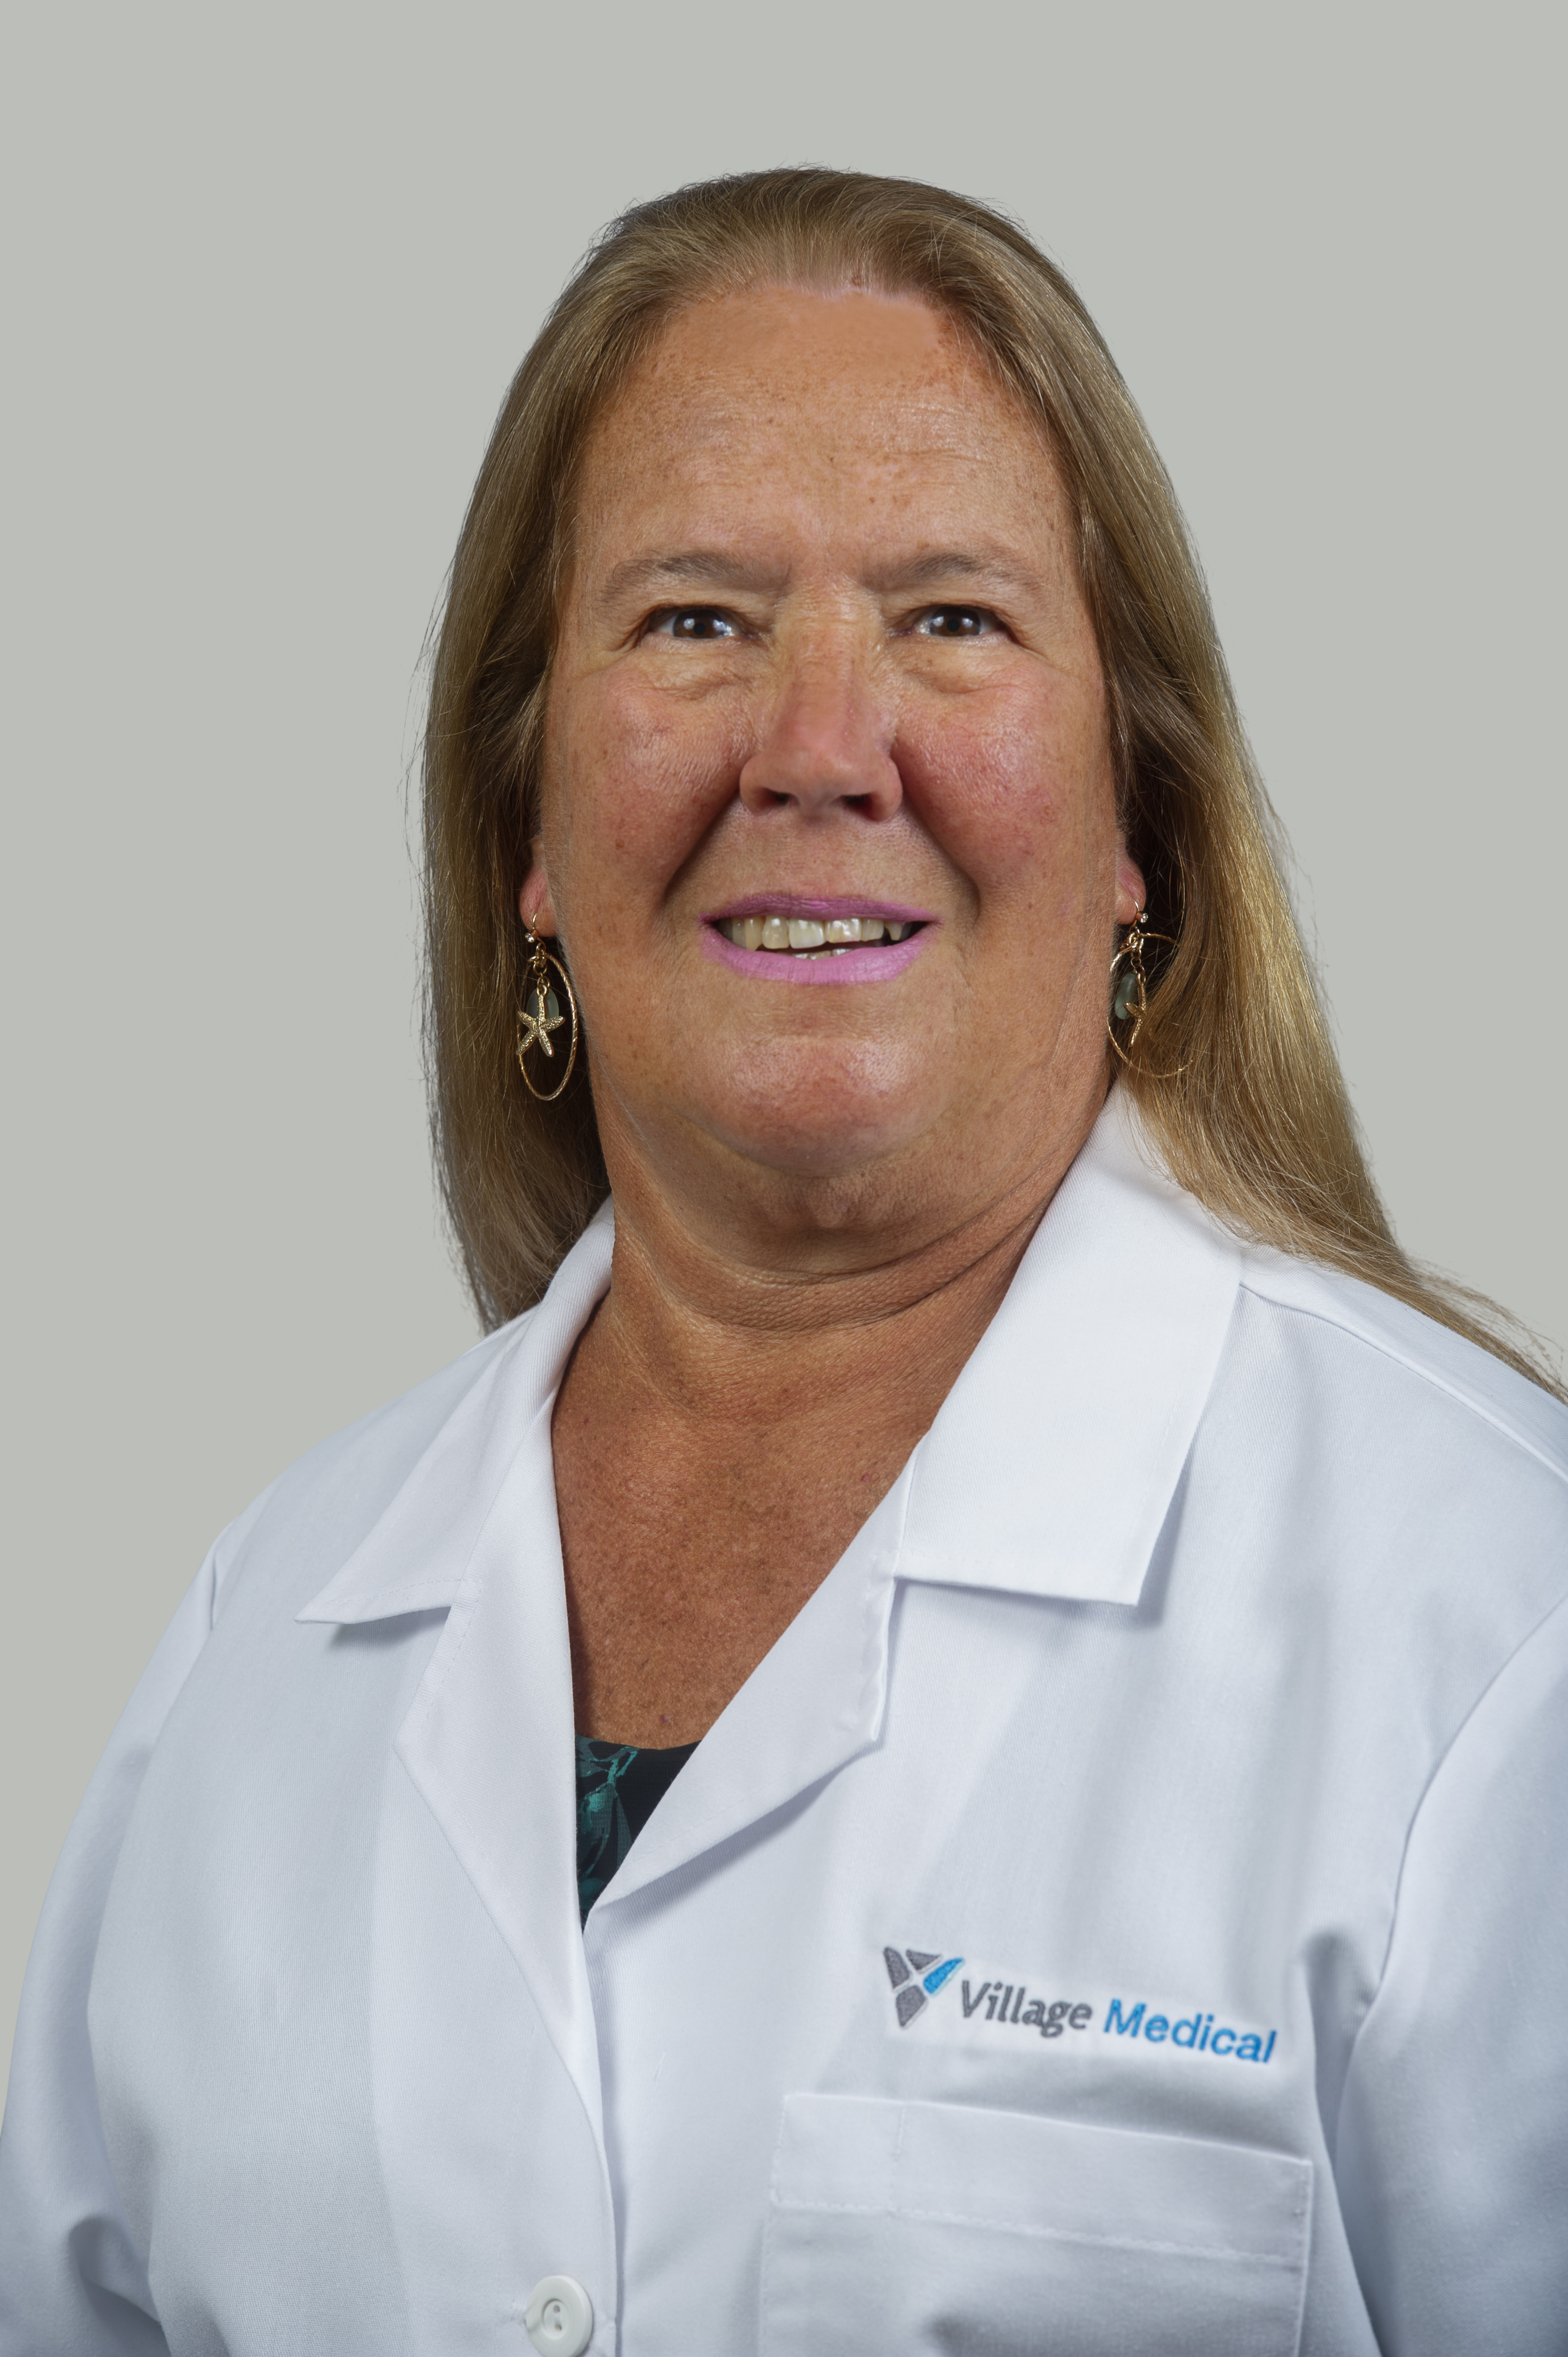 Deborah Parlett, APN-C